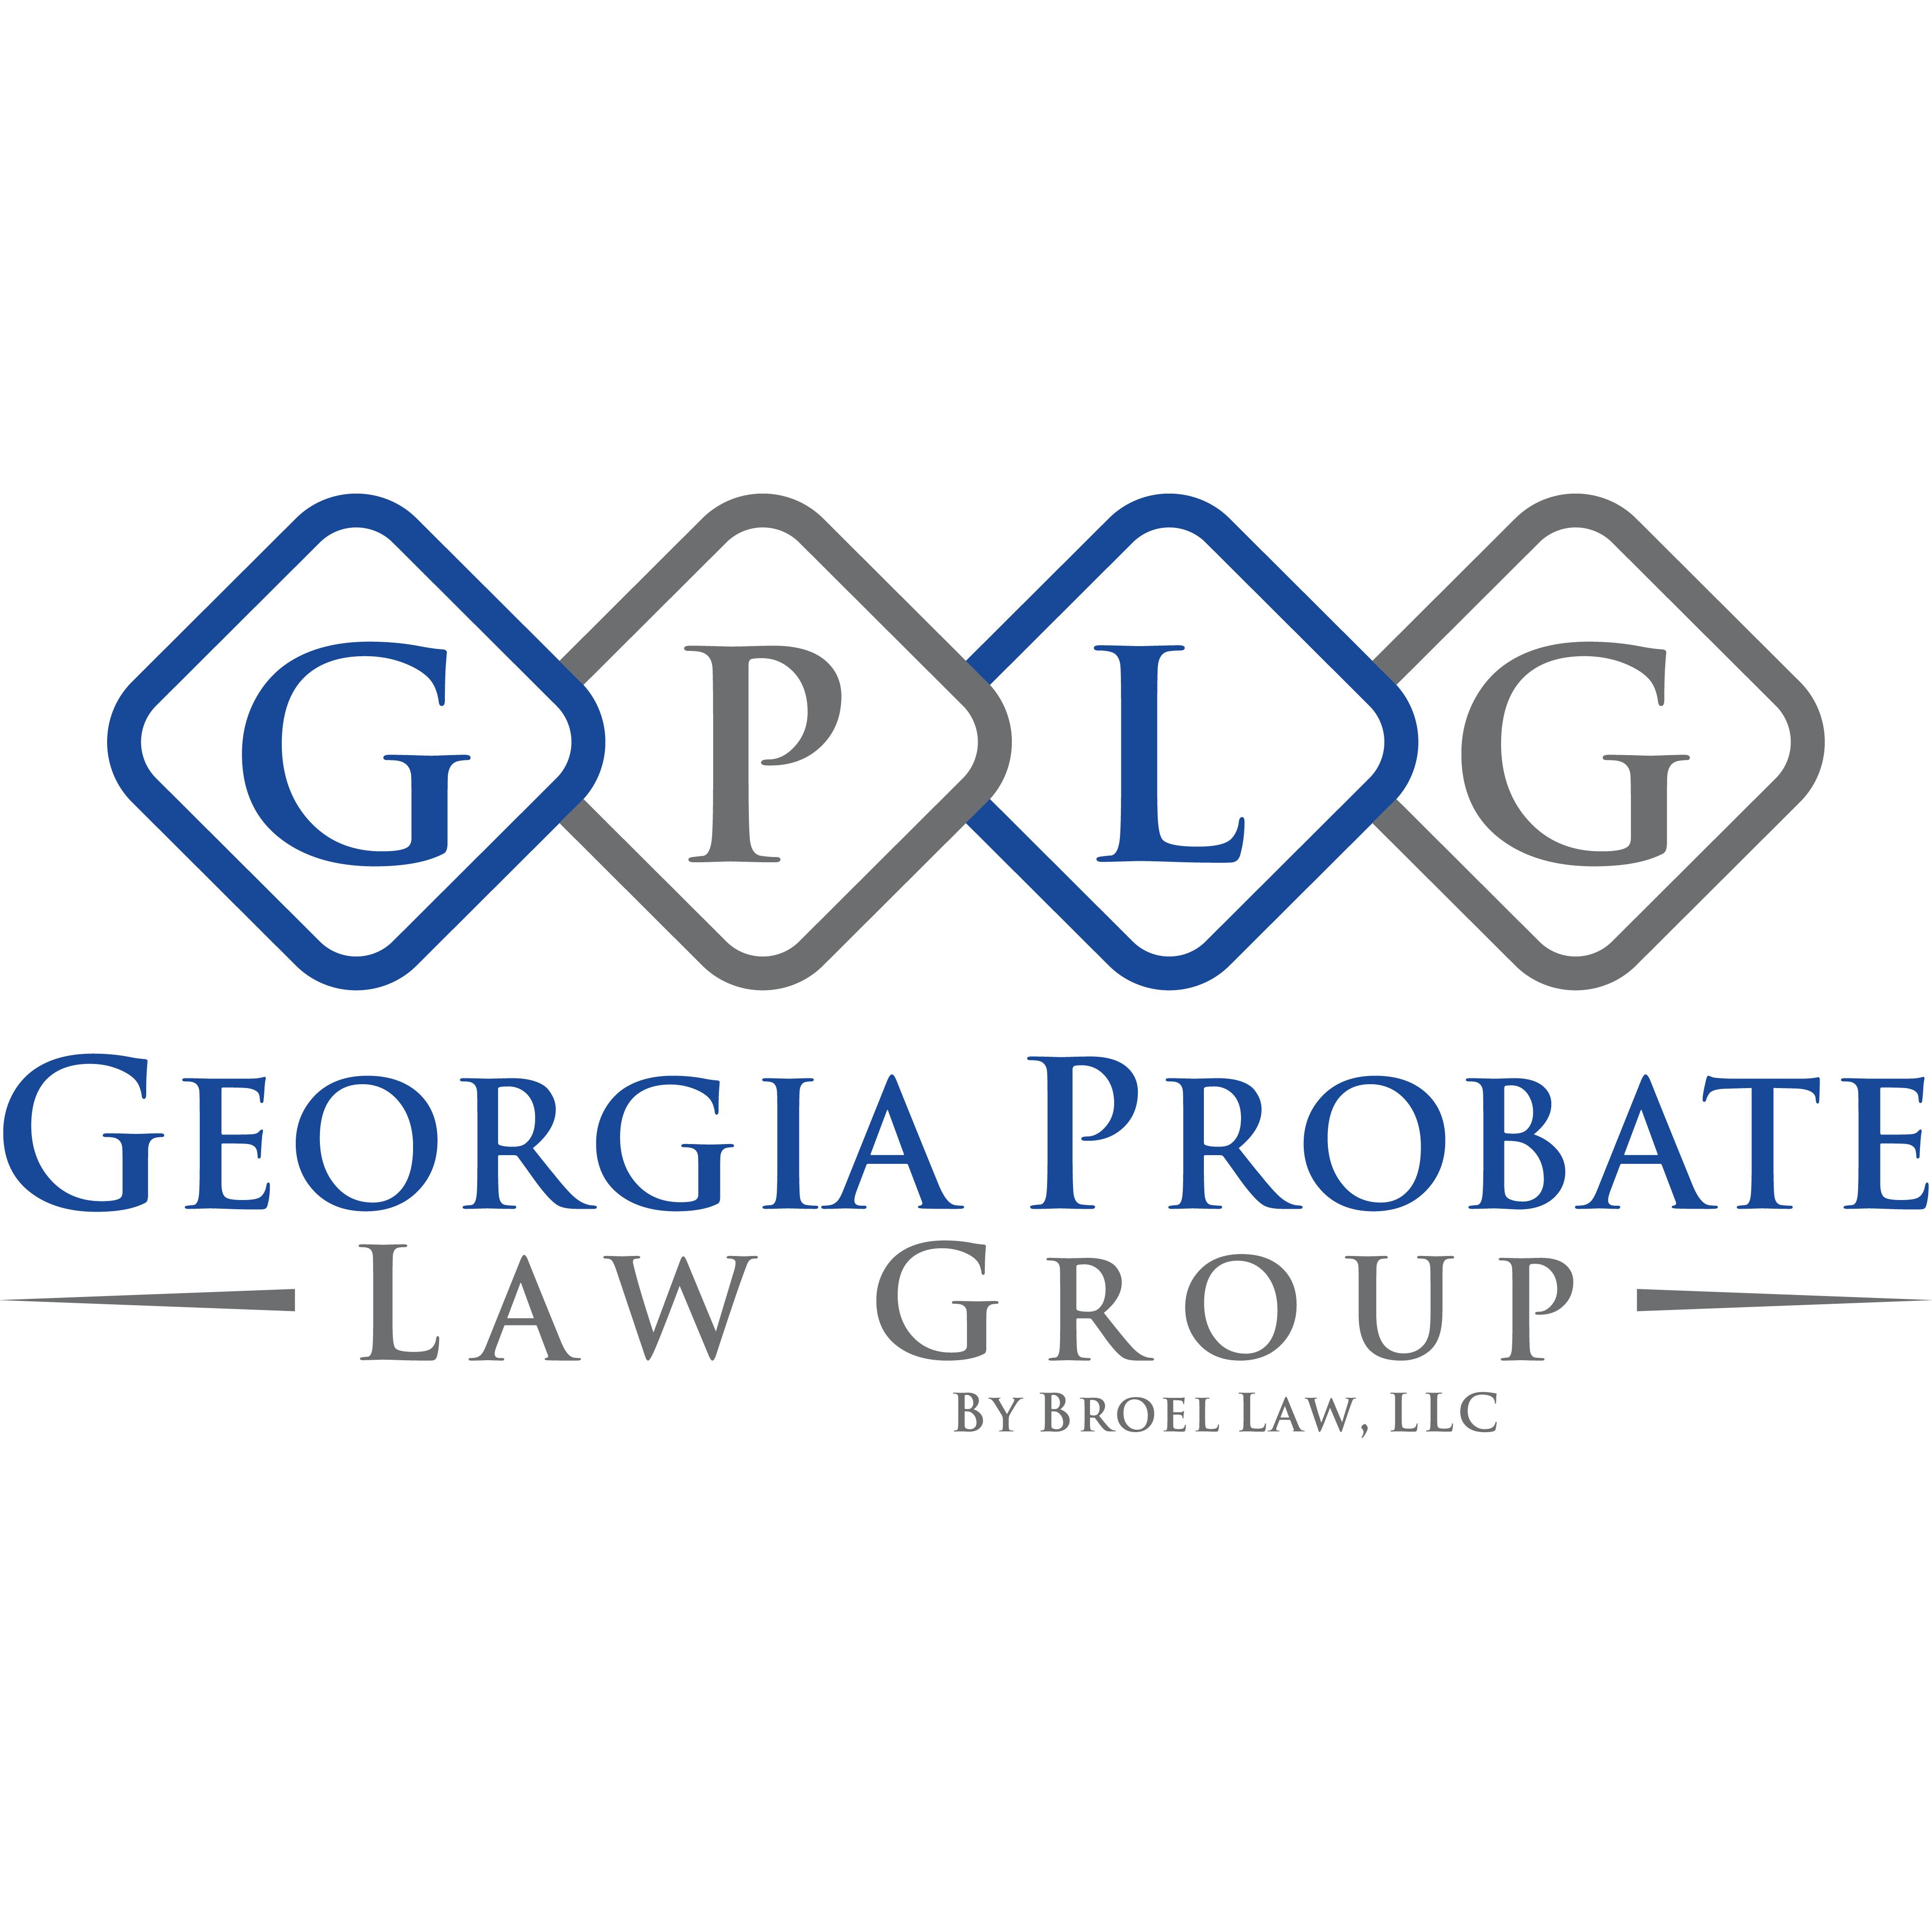 Georgia Probate Law Group